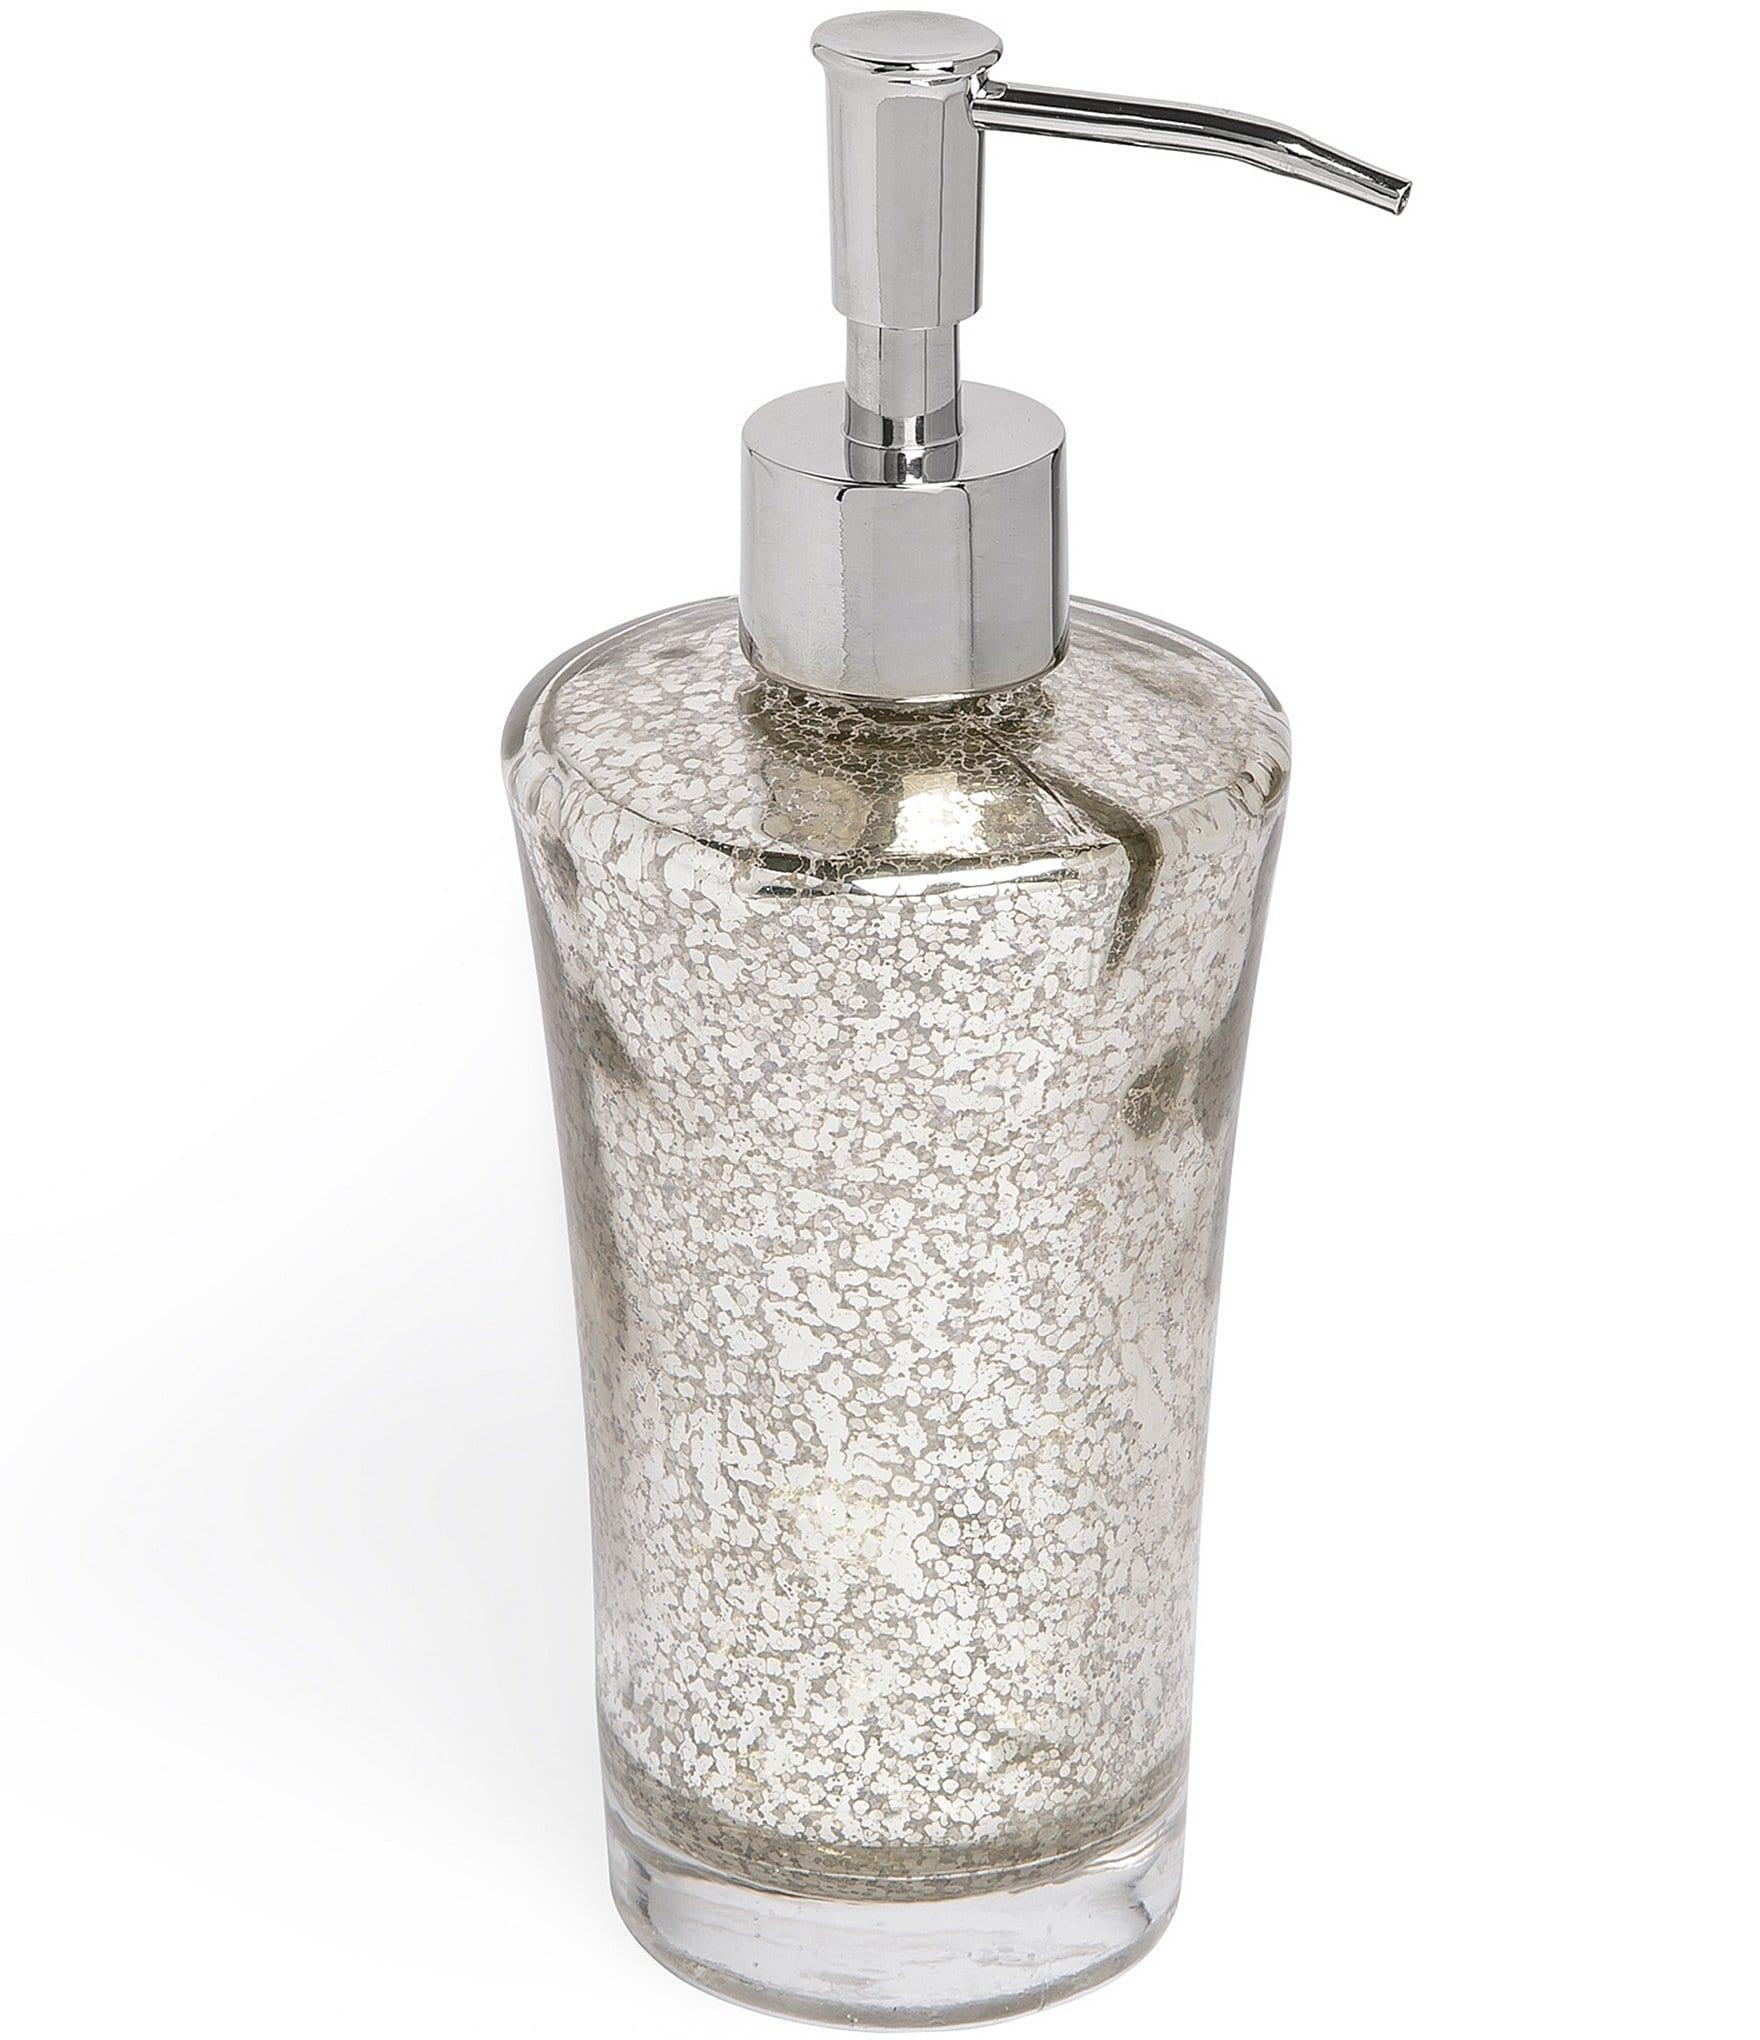 Kassatex vizcaya lotion dispenser dillards for Dillards bathroom accessories sets